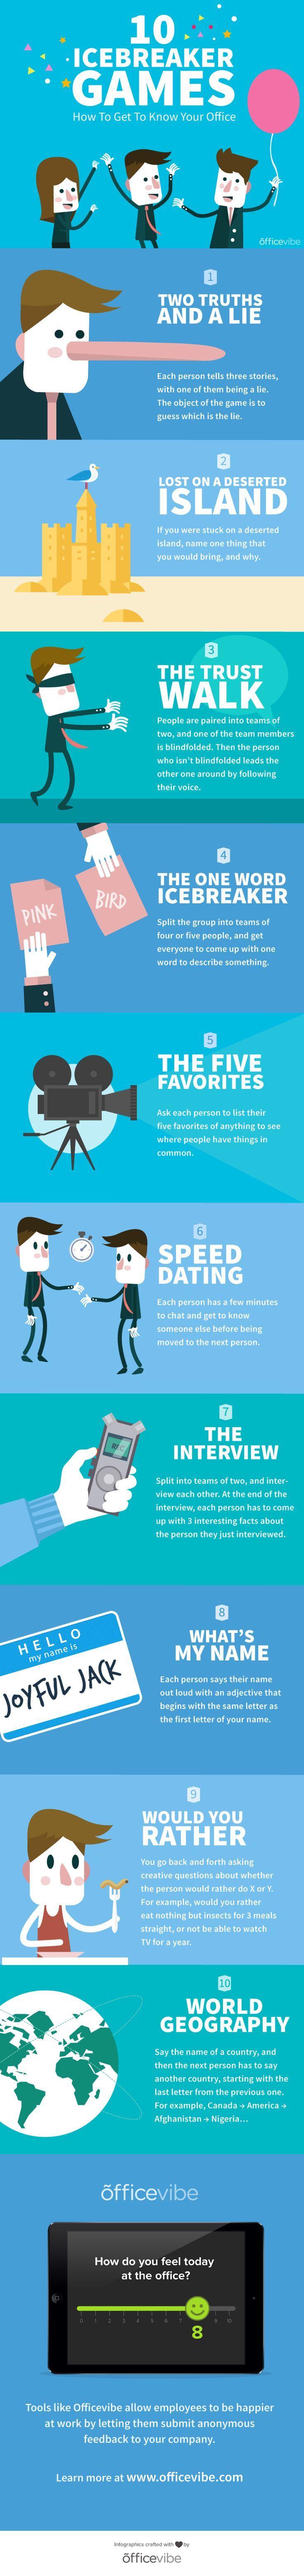 Speed dating icebreaker games